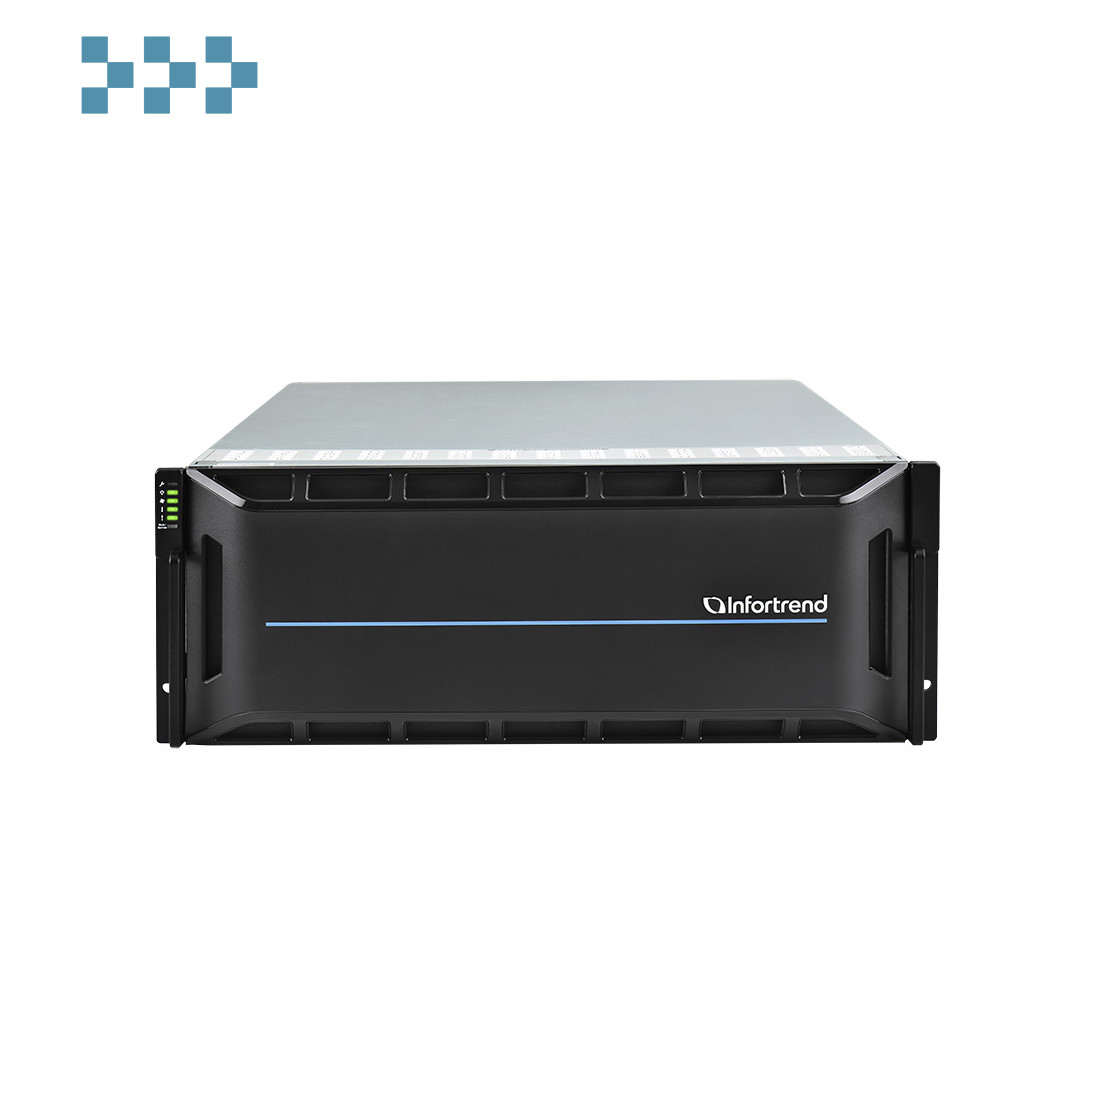 Система хранения данных Infortrend GS 3060GLF-D